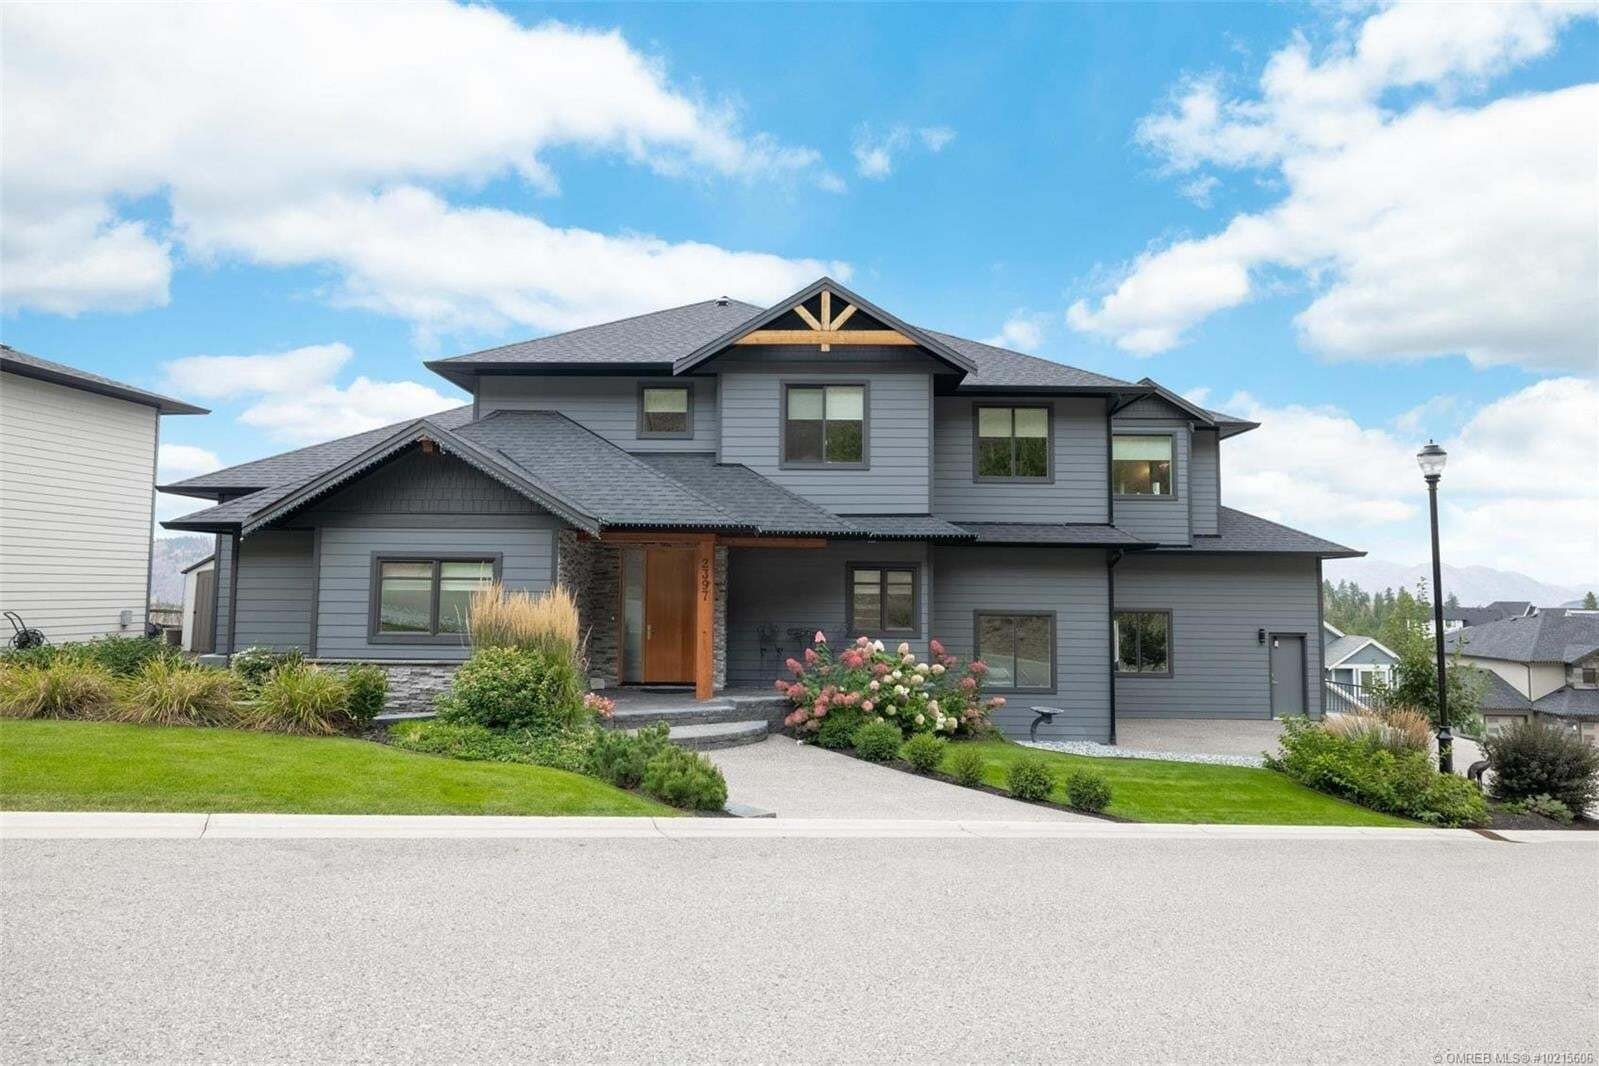 House for sale at 2397 Big Sky Dr West Kelowna British Columbia - MLS: 10215606